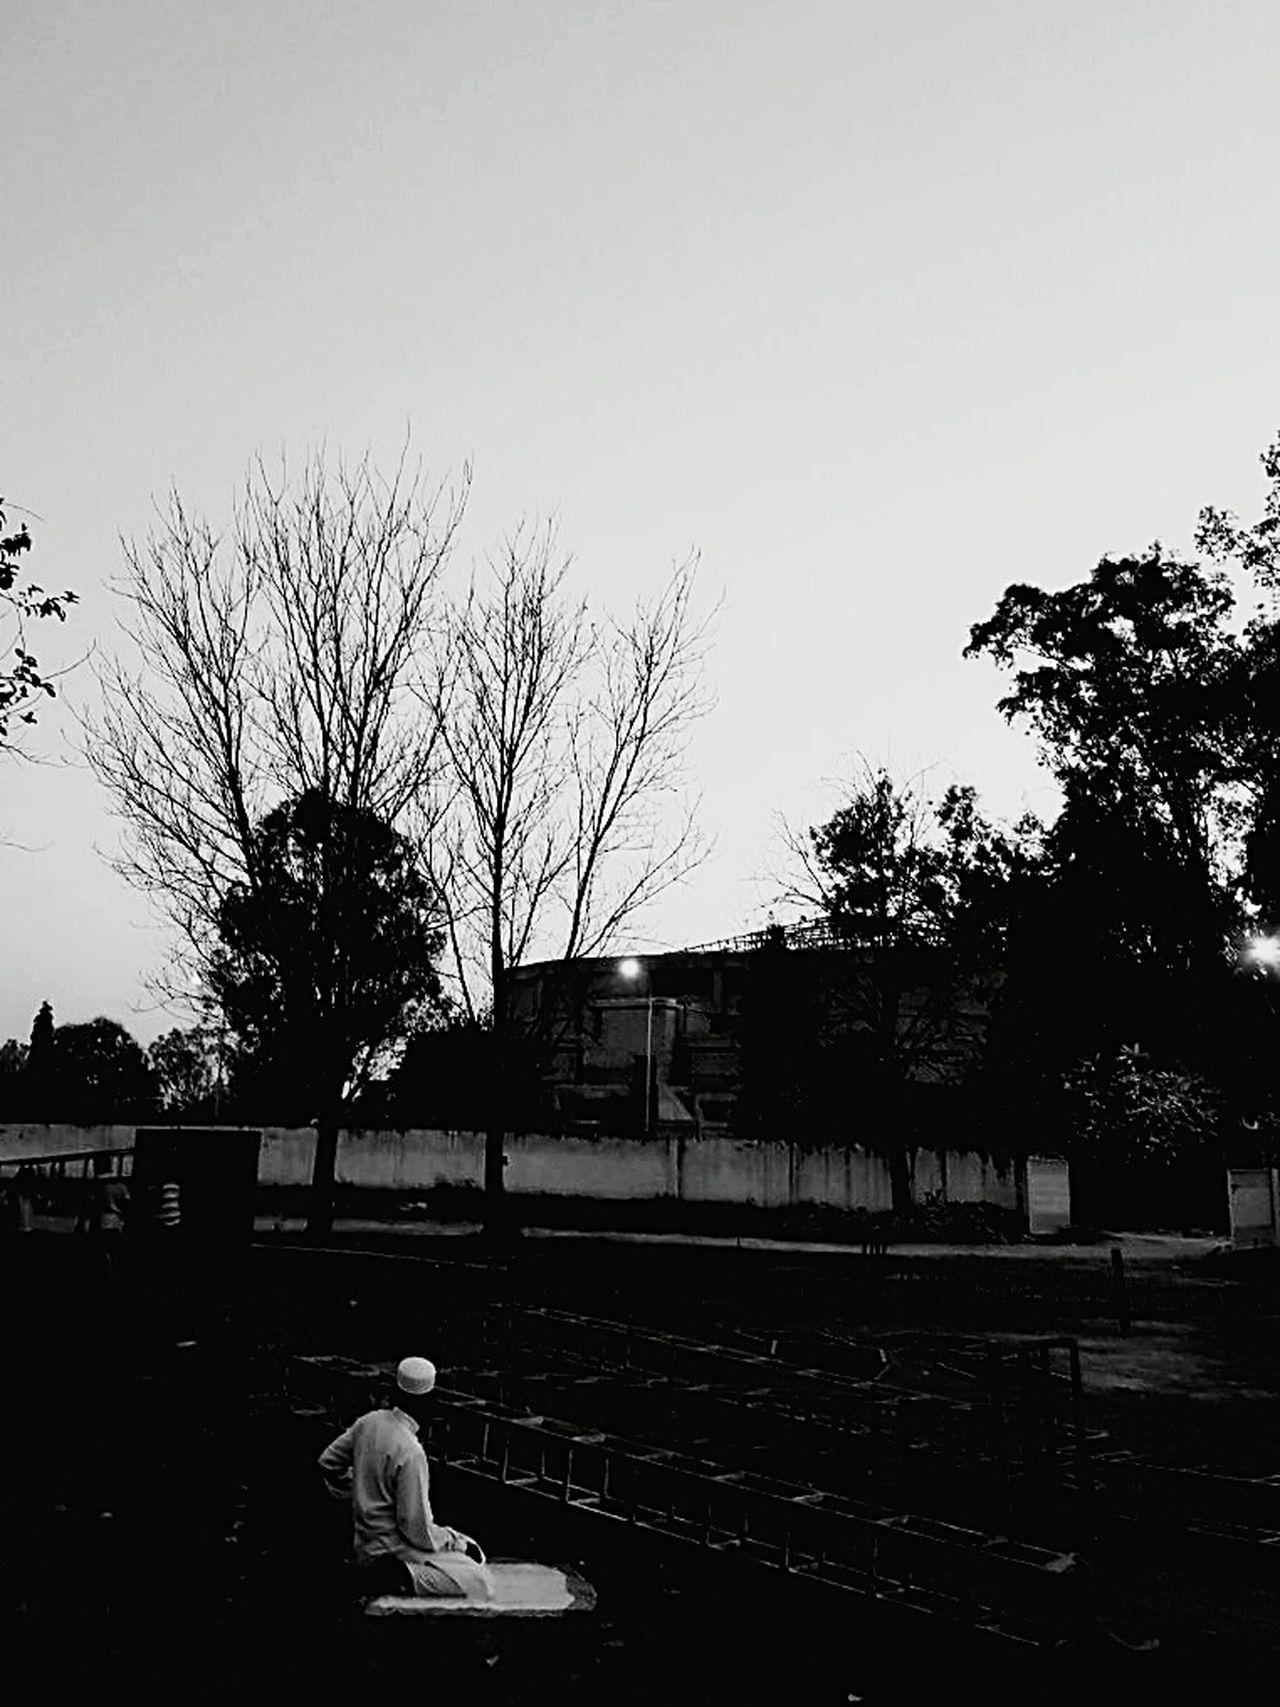 monochrome Black & White Backyardphotography Asthetics Finding Inspiration FindingpeacewithGod Resist